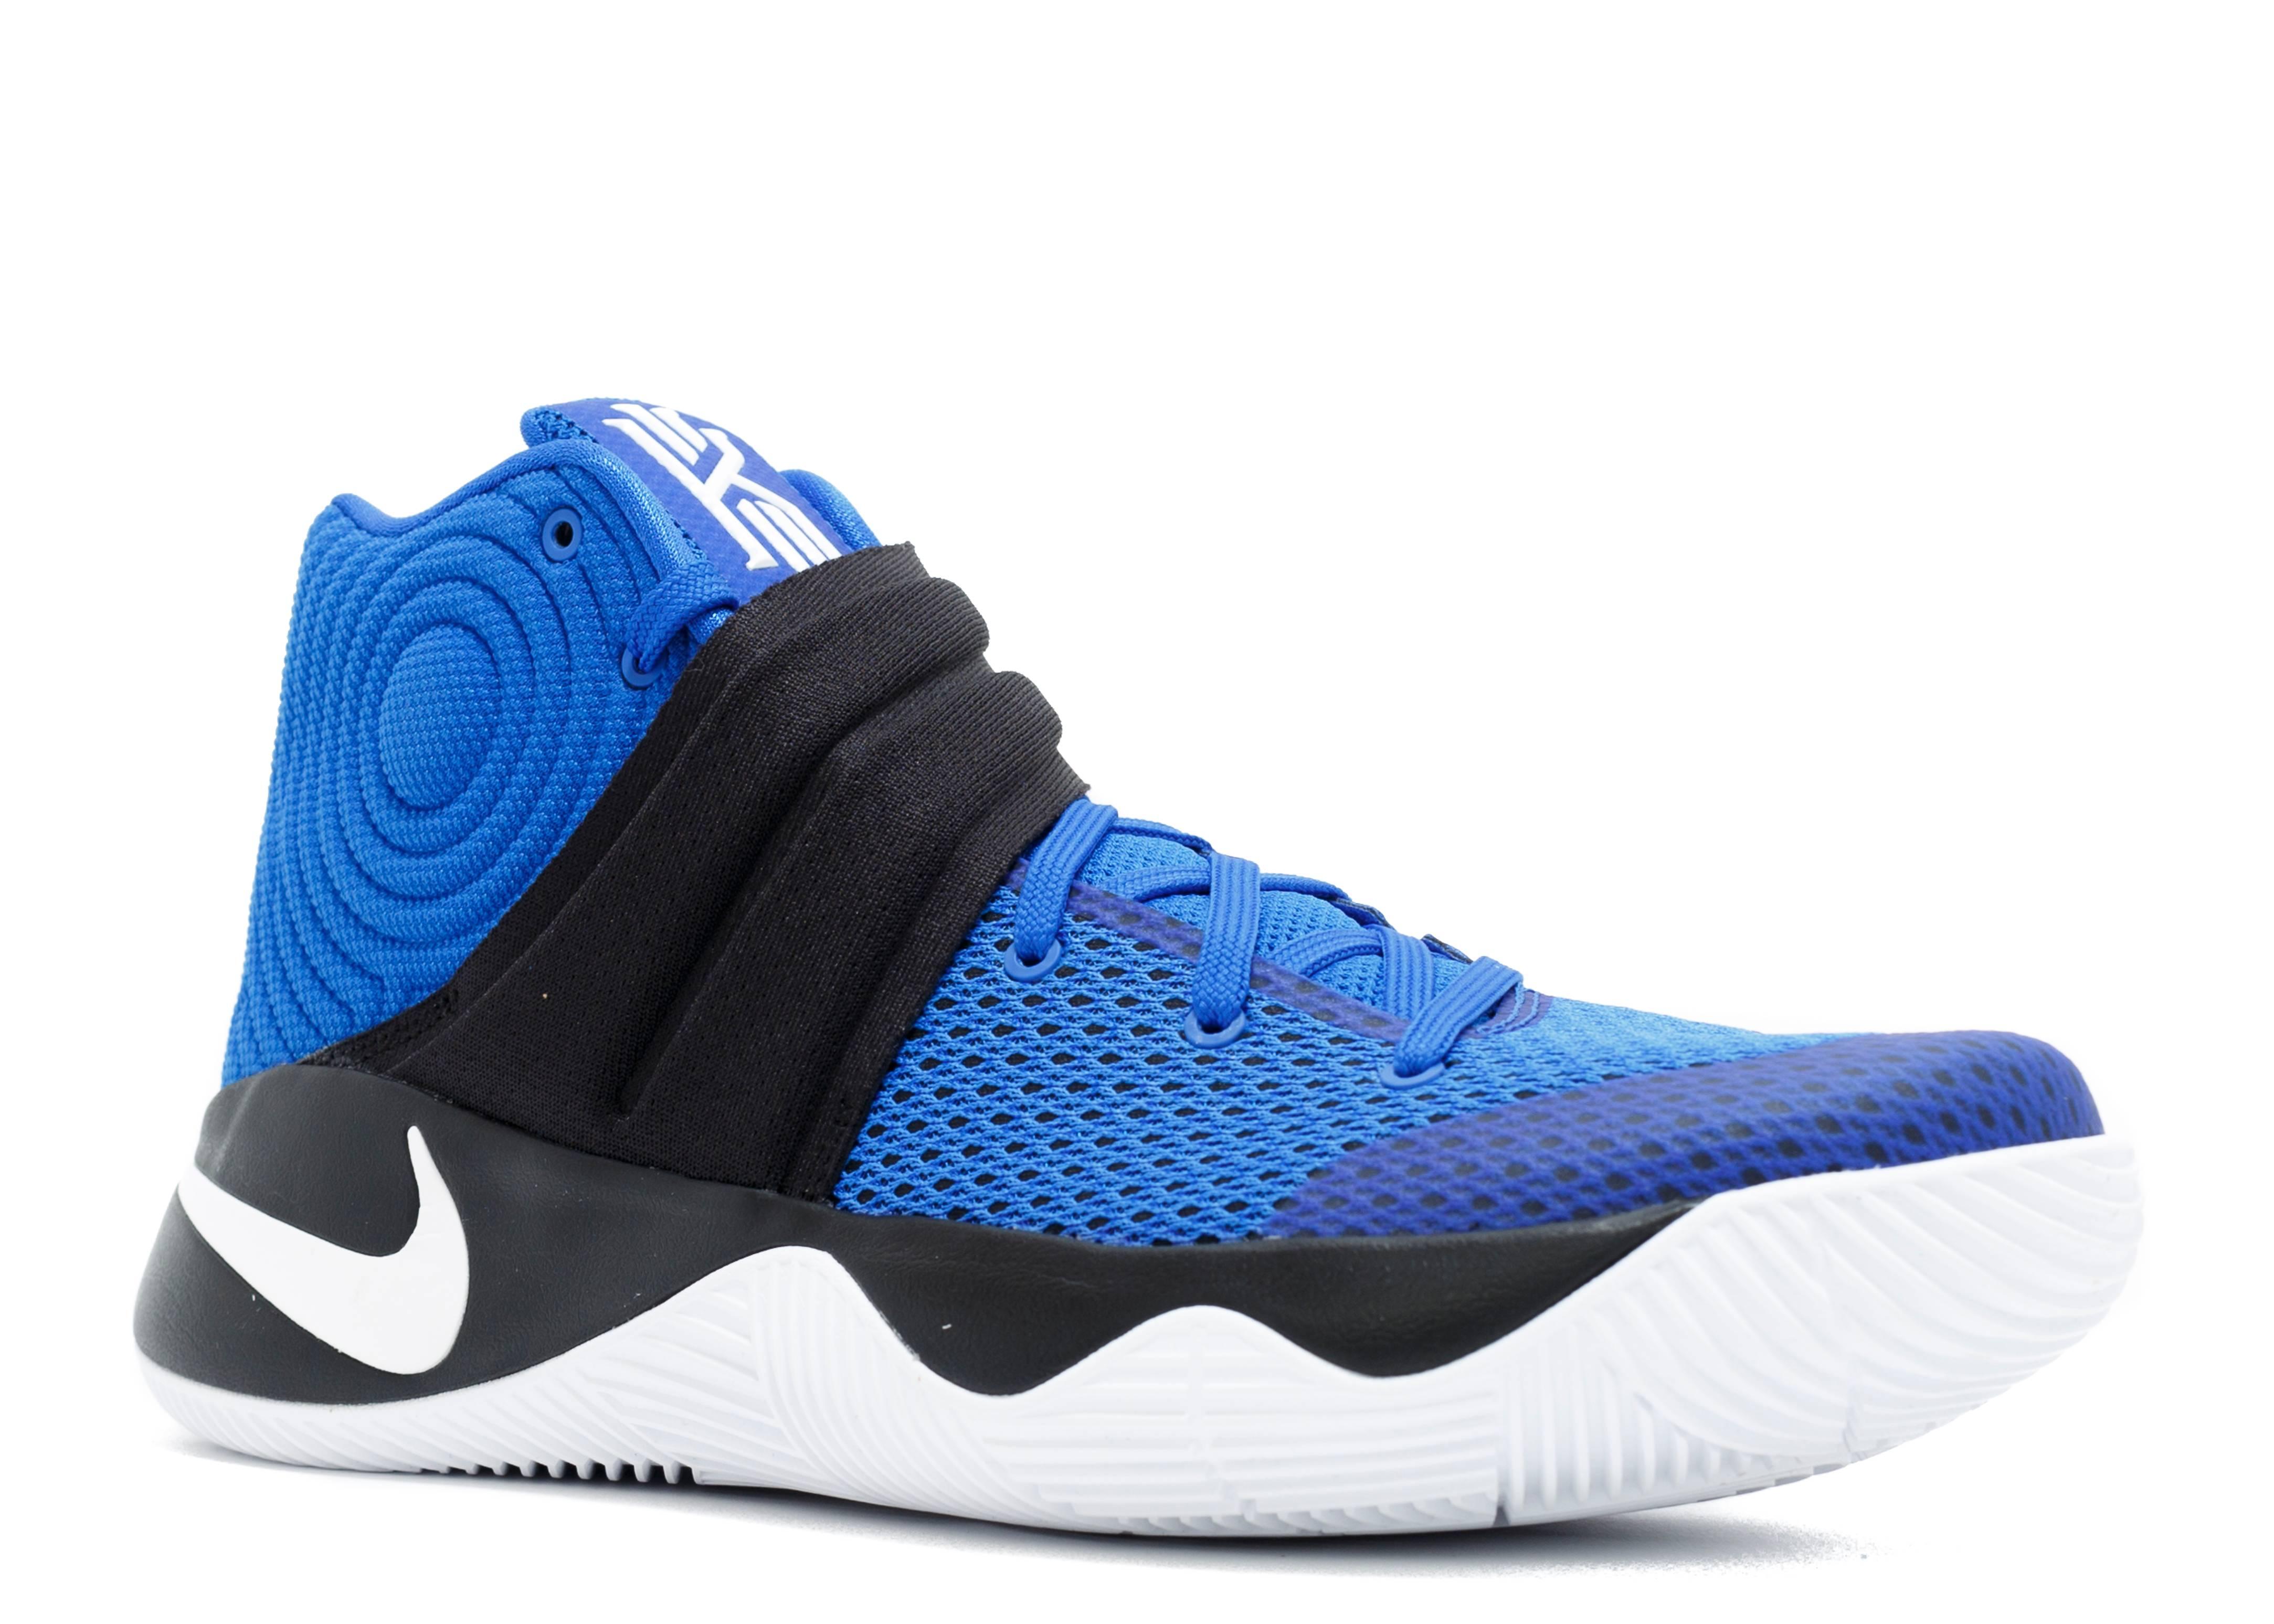 Nike Kyrie Brotherhood Hyper Cobalt White Black